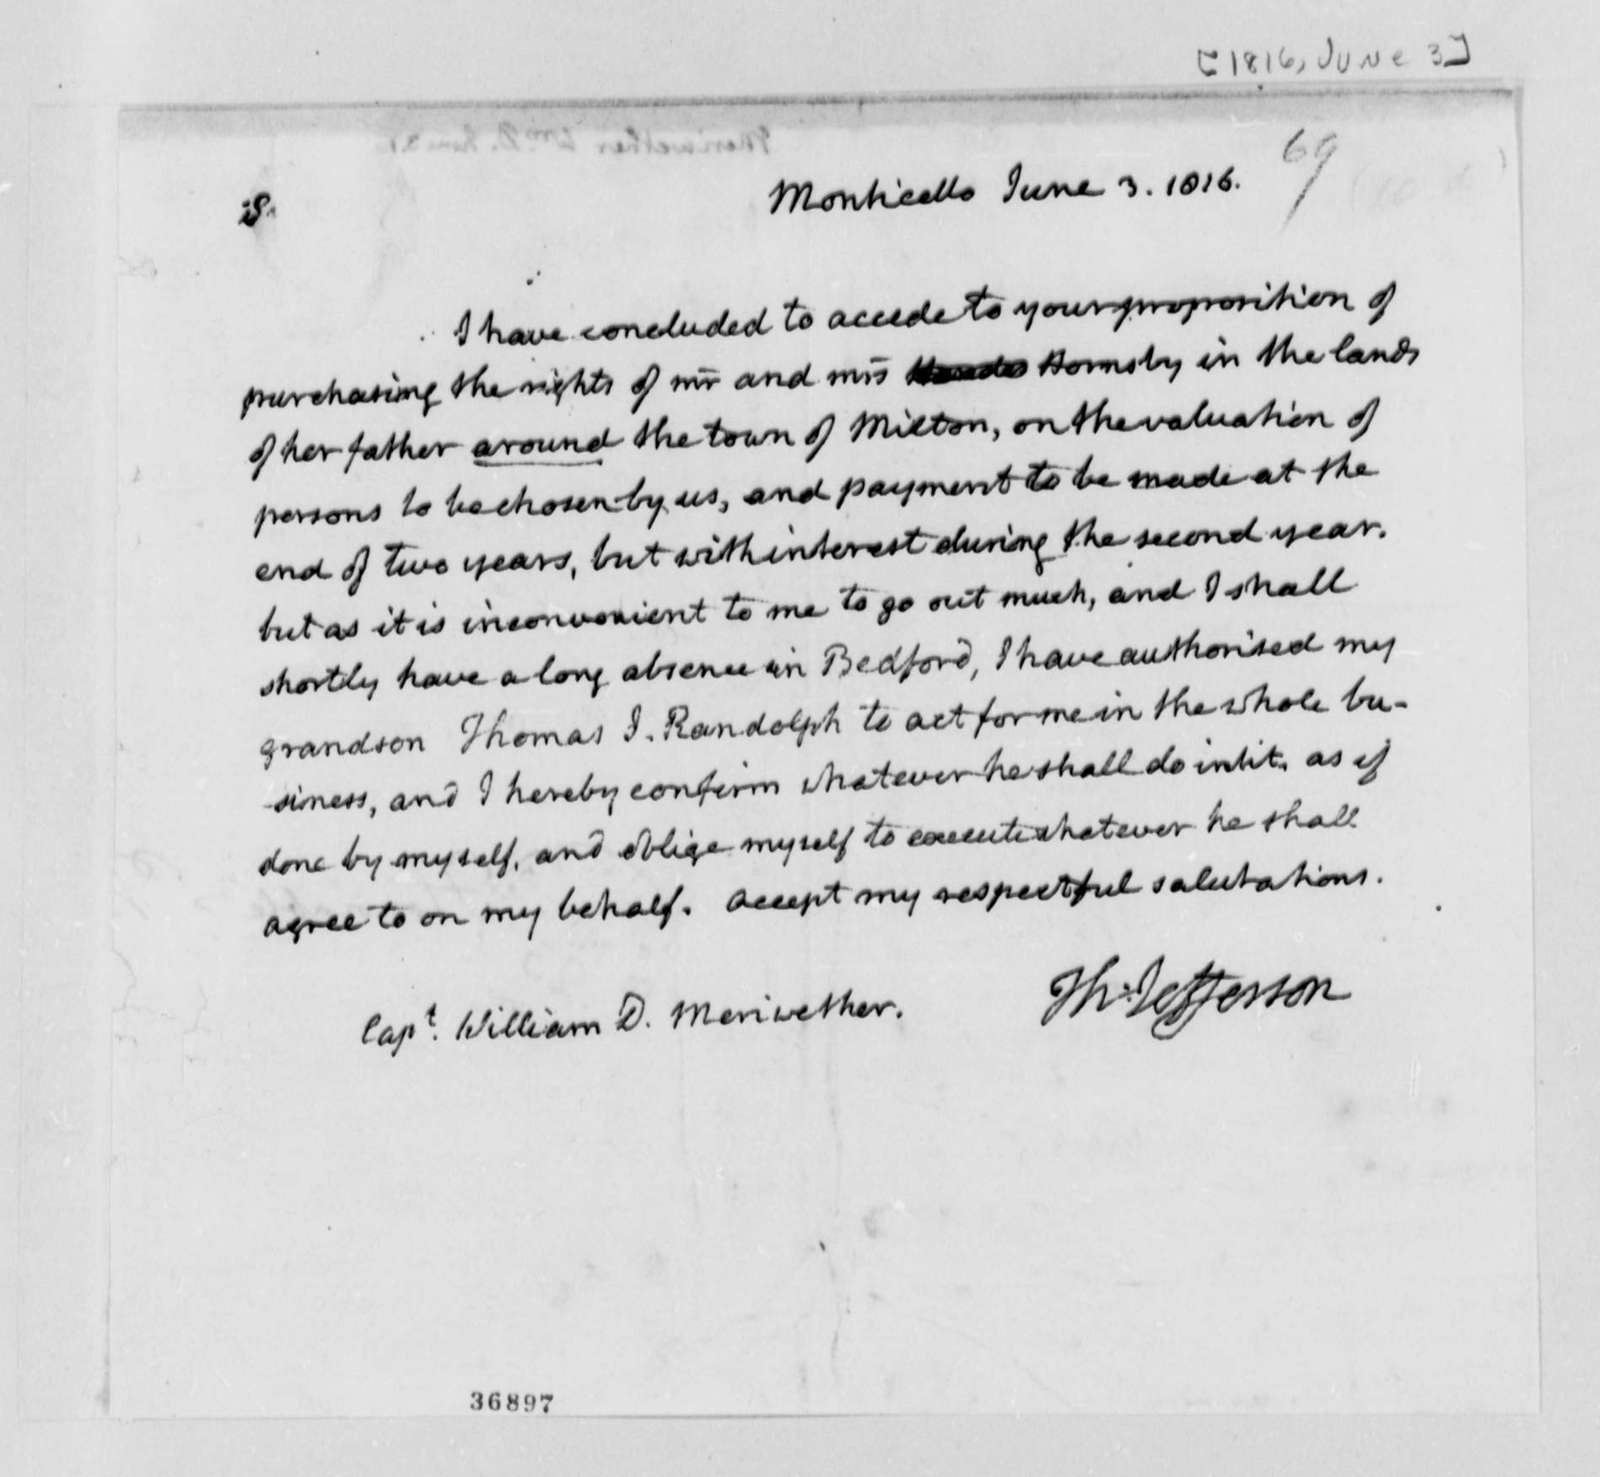 Thomas Jefferson to John F. Meriwether, May 3, 1816